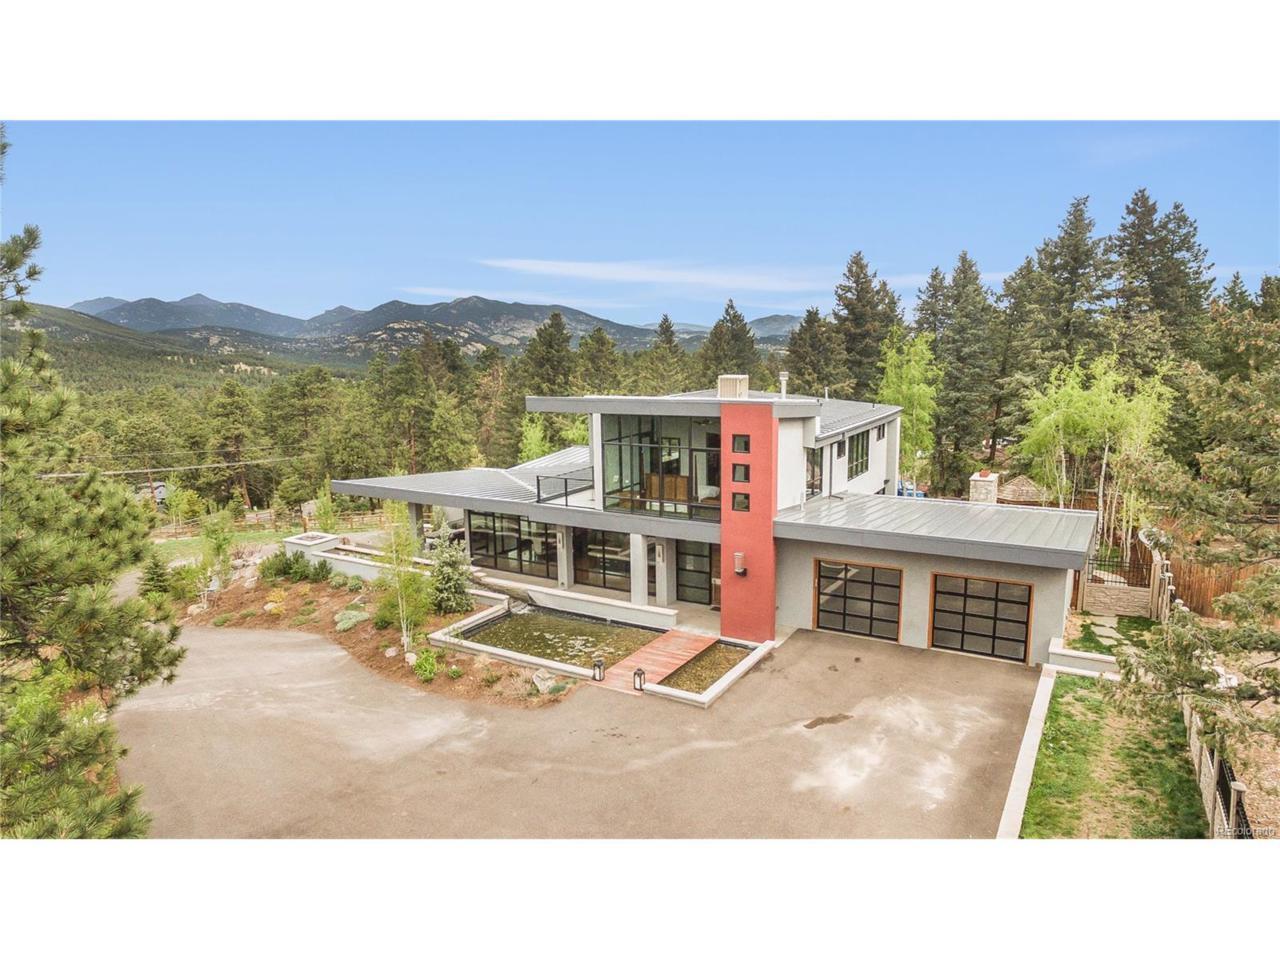 6520 Highway 73, Evergreen, CO 80439 (MLS #7964946) :: 8z Real Estate